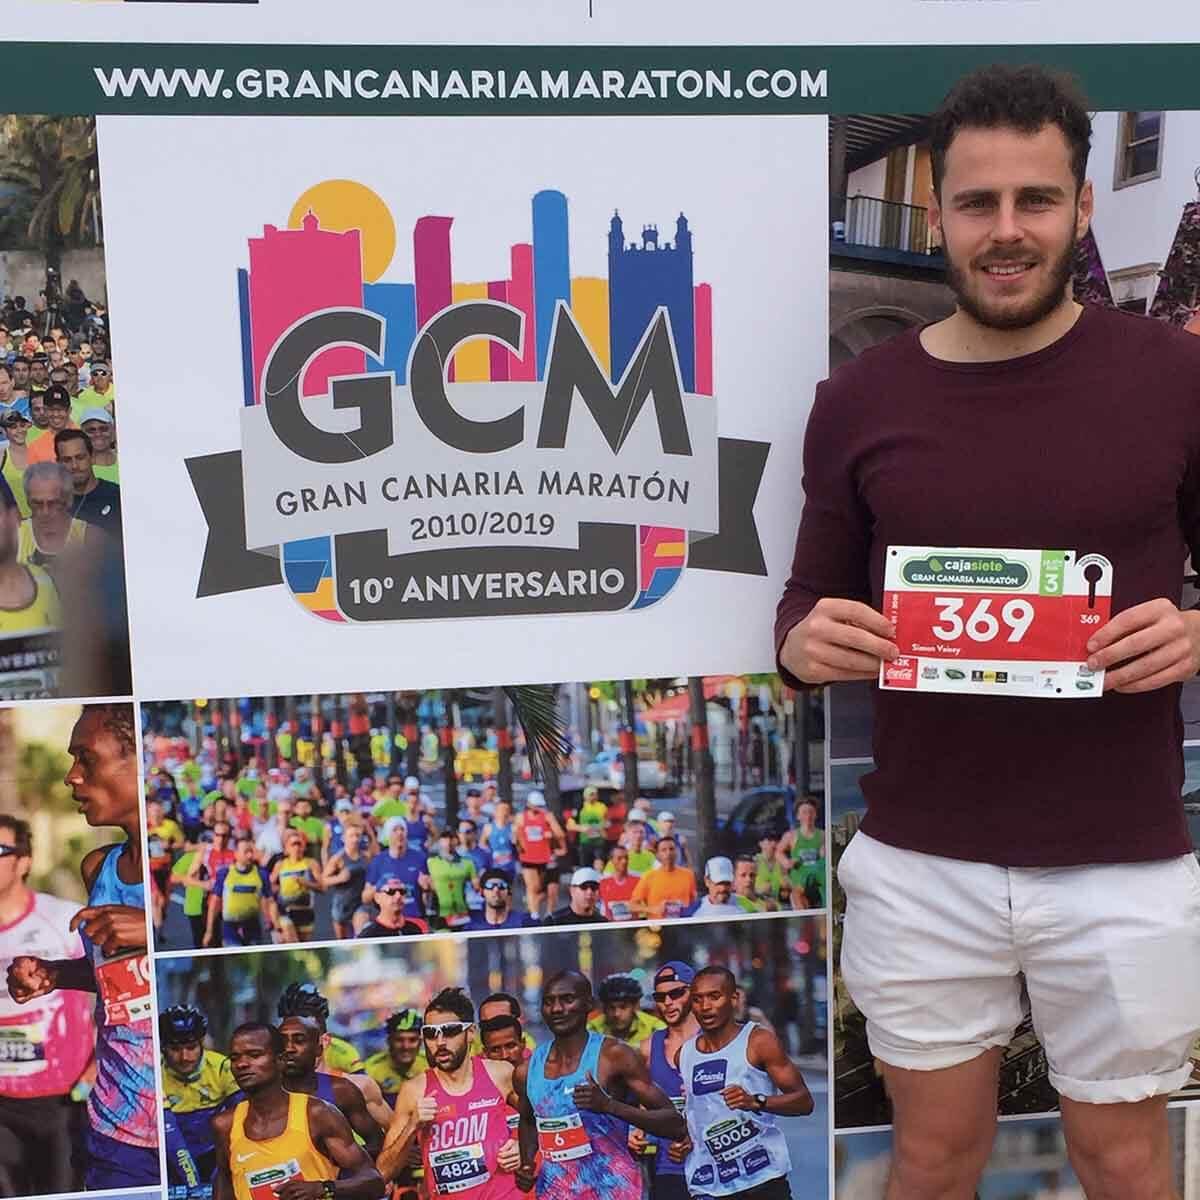 HOKA fan Simon before his marathon in Gran Canaria